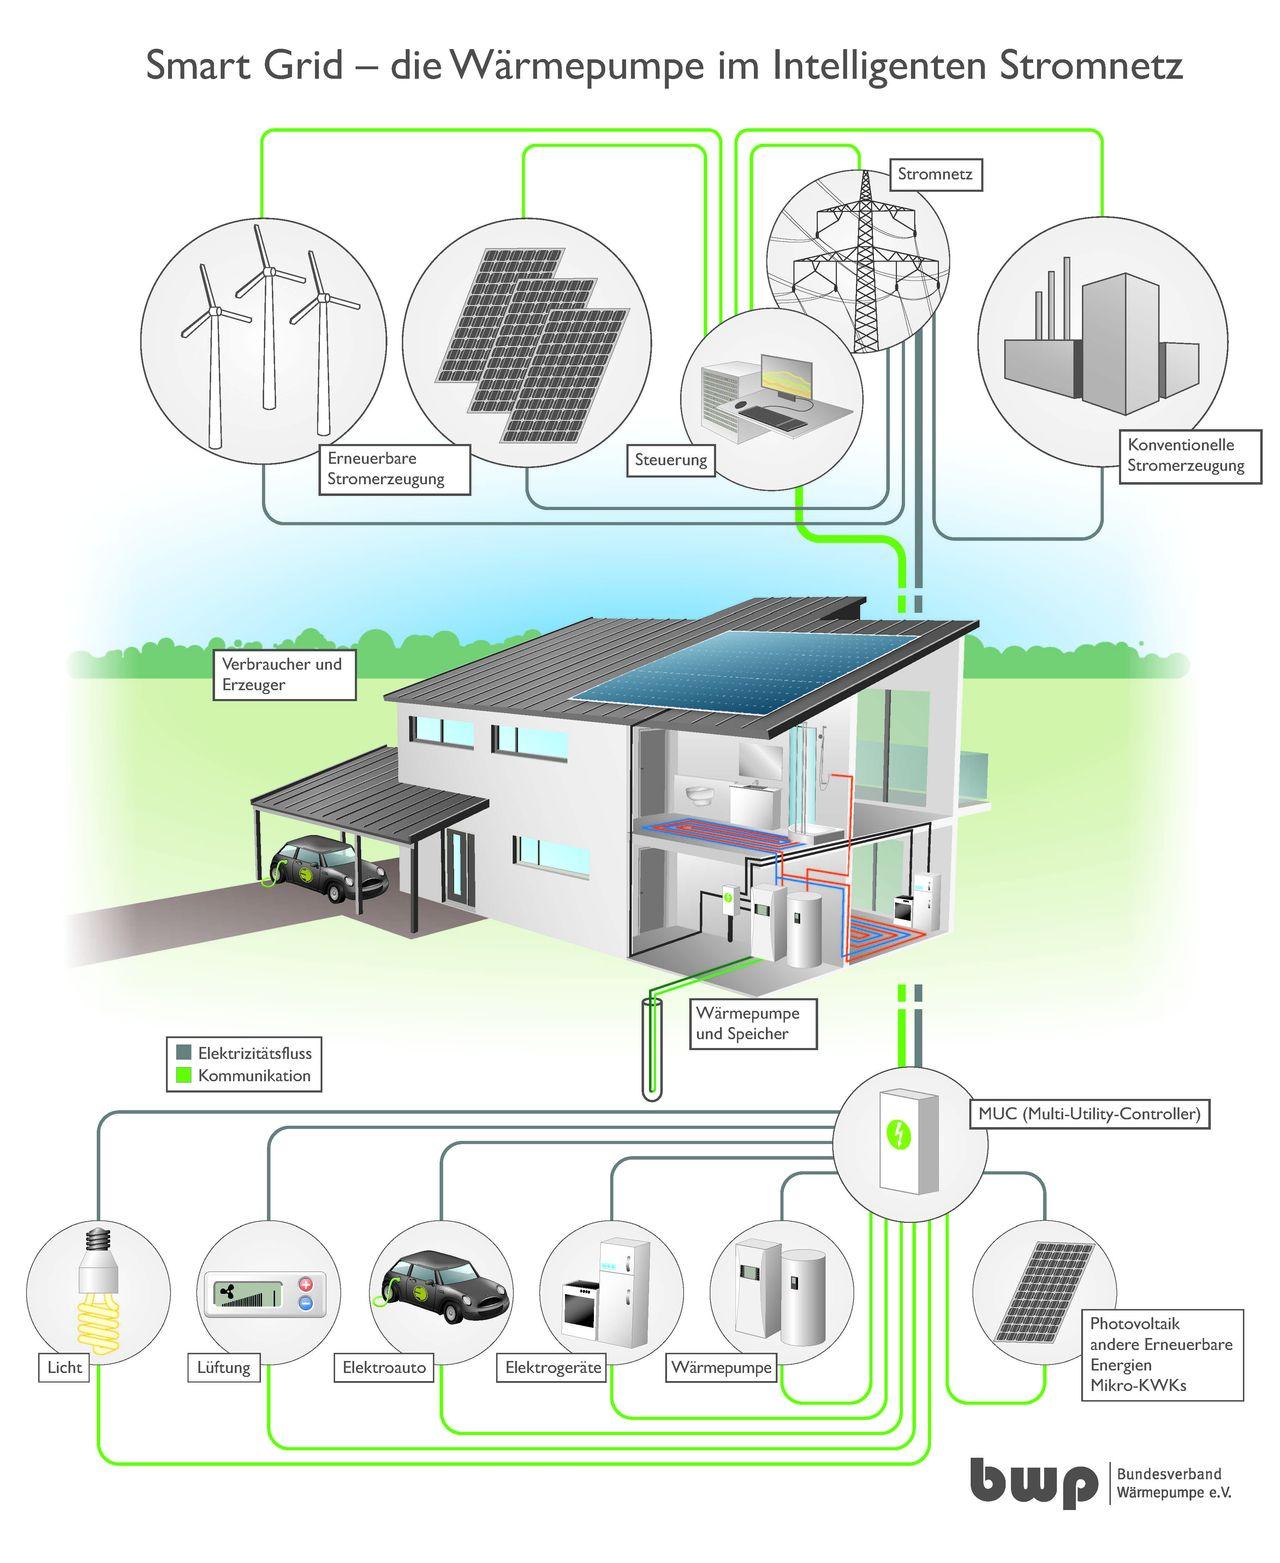 csm Infografik Smart Grid-Waermepumpe intelligentes Stromnetz